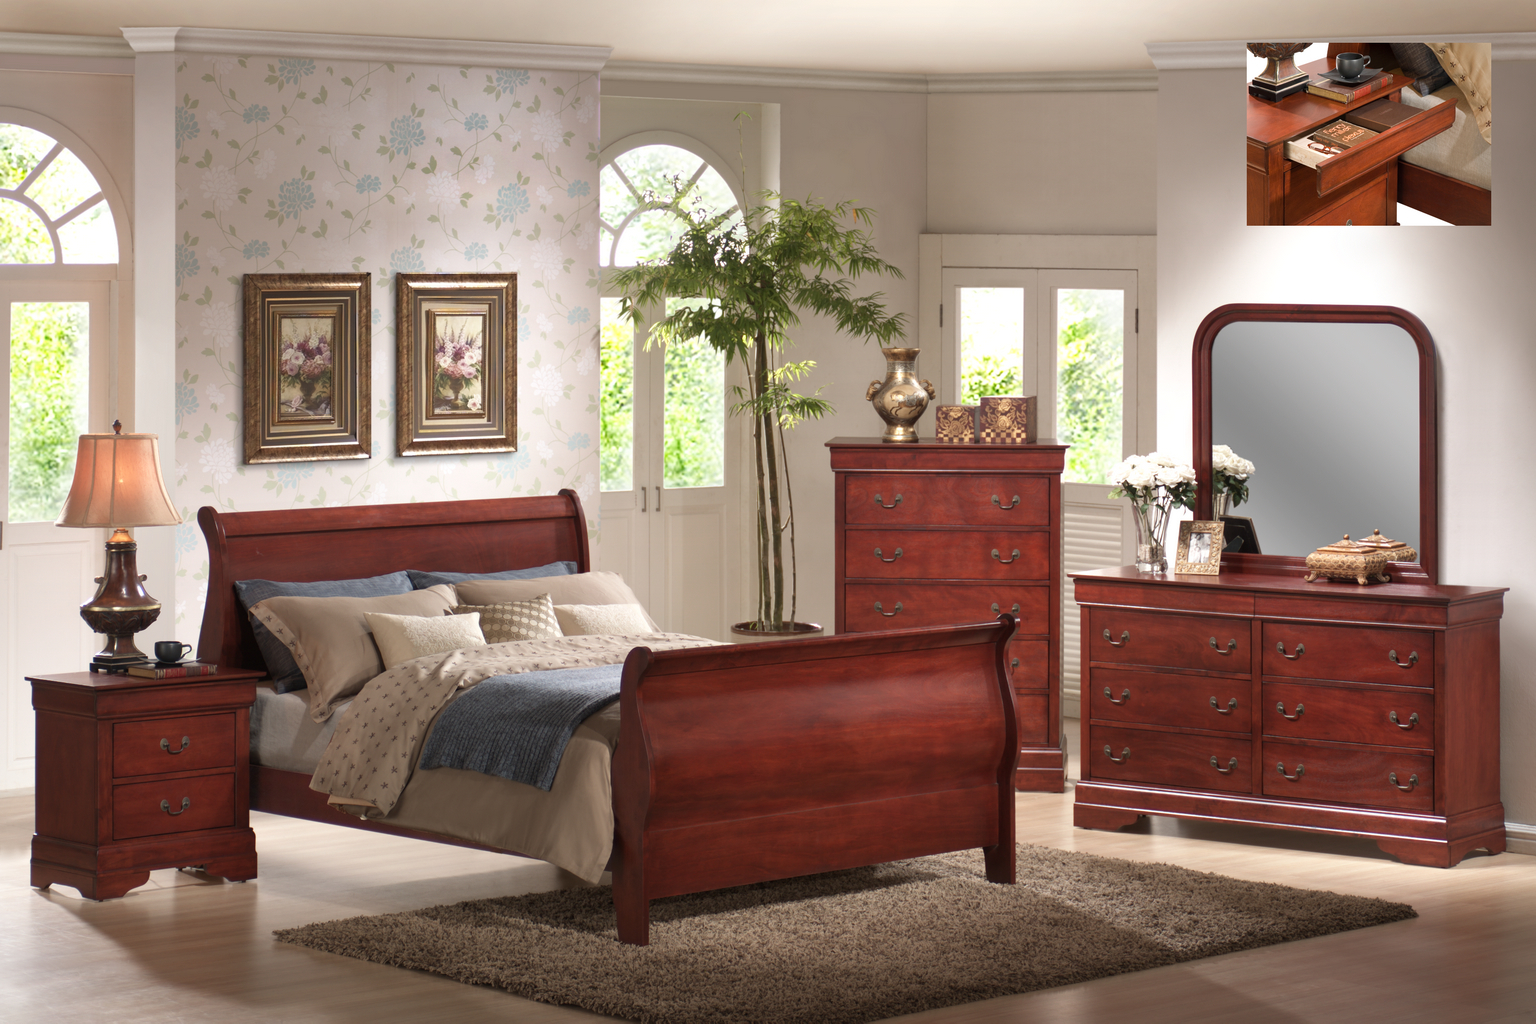 Furniture Distribution Center In Tampa Fl Whitepages